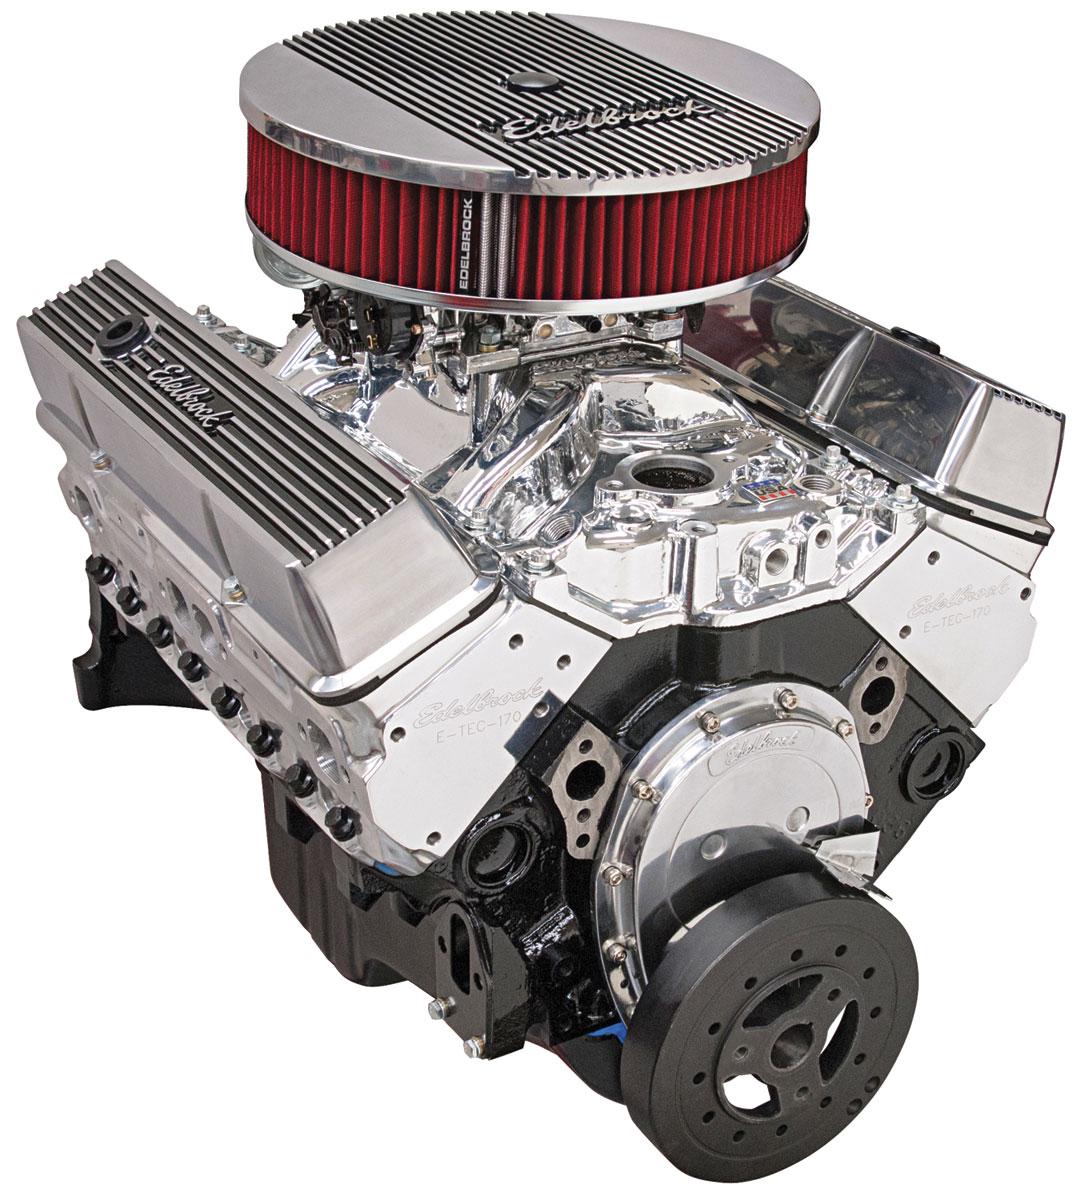 Crate Engine, Performer Hi-Torq, Edelbrock, Chevy 350, w/o Wtr Pmp, EnduraShine